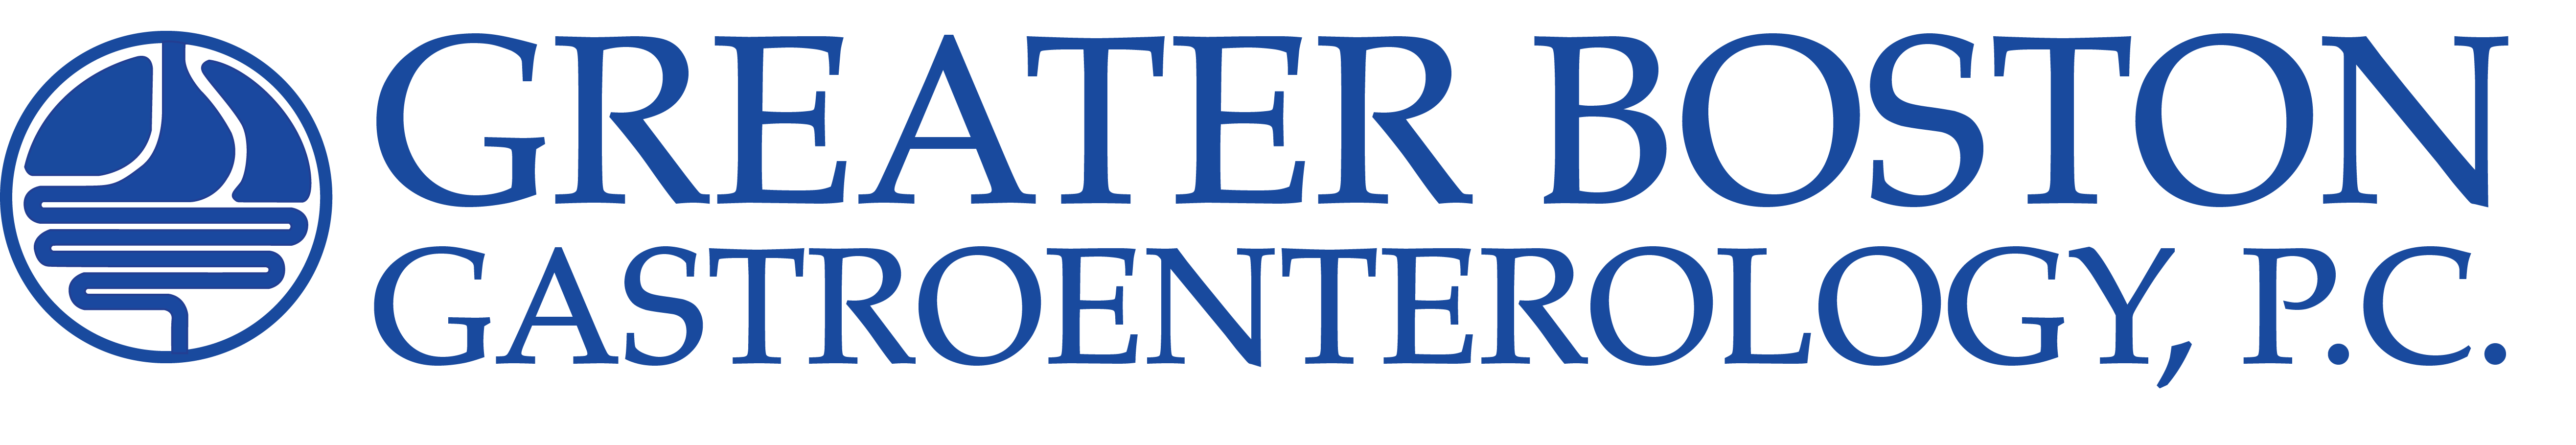 greater boston gastroenterology p c providing the best healthflex